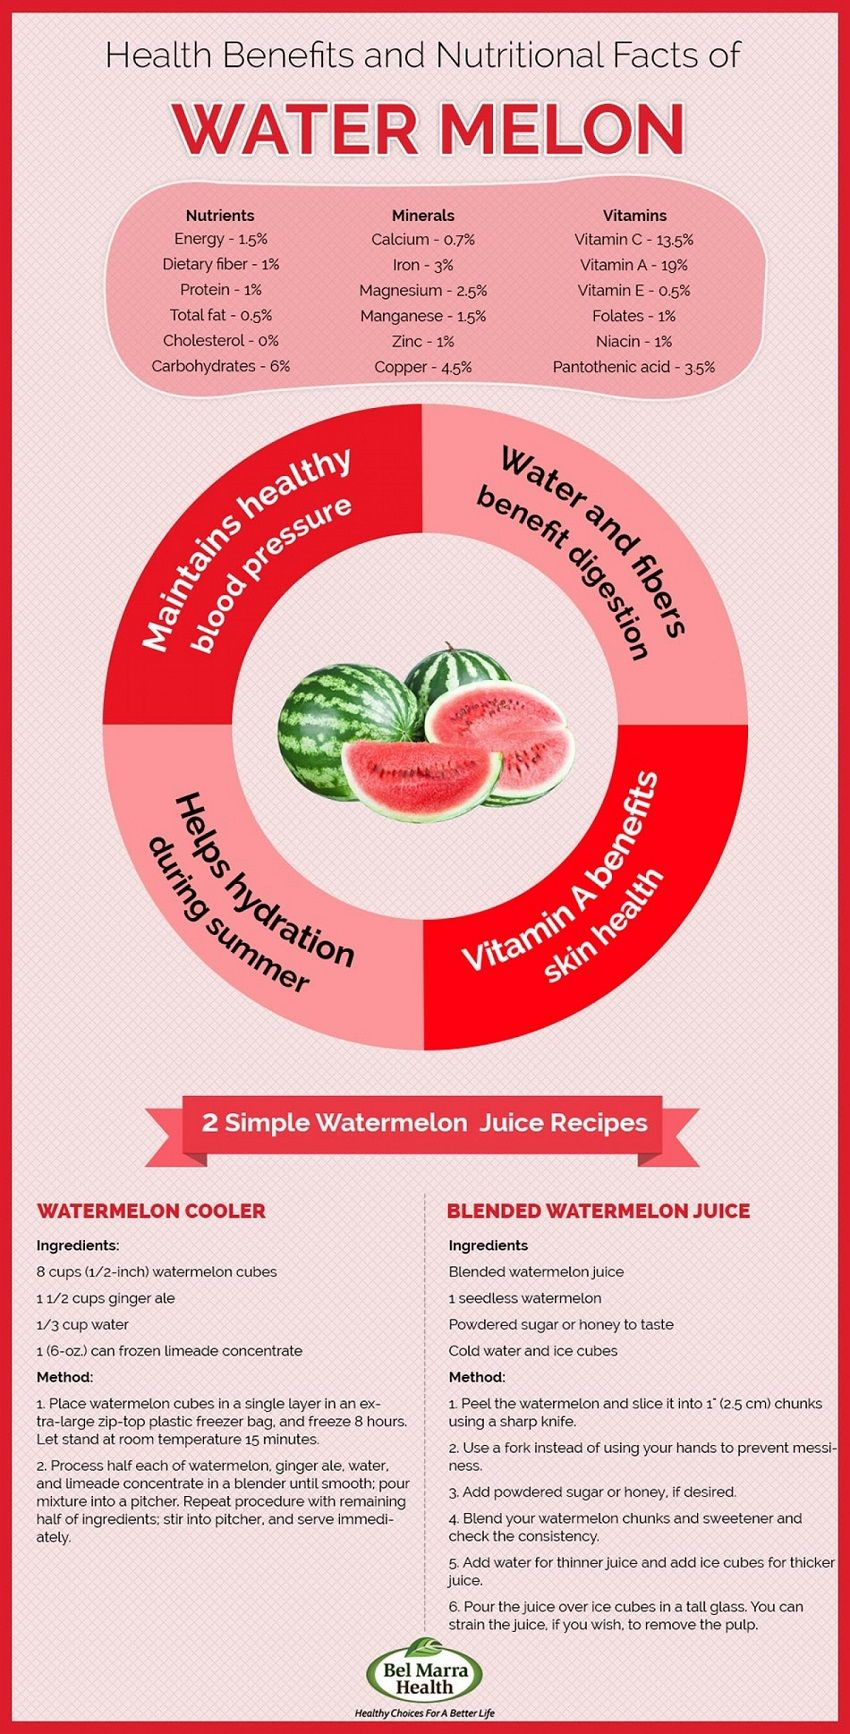 Diet meal delivery plans comparison image 5